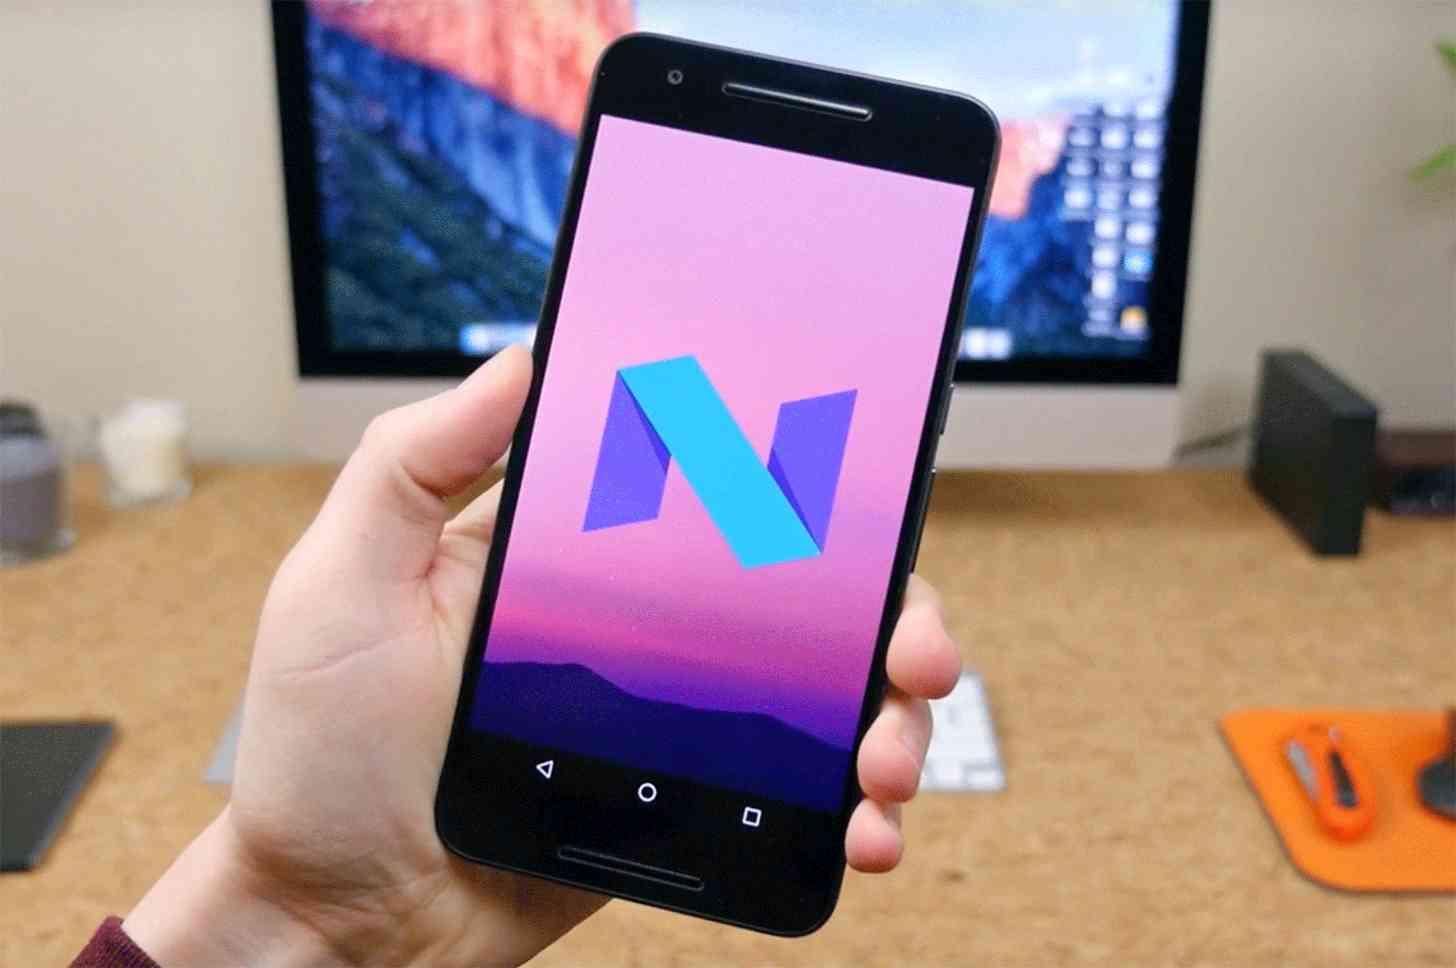 Android 7.0 Nougat Easter egg